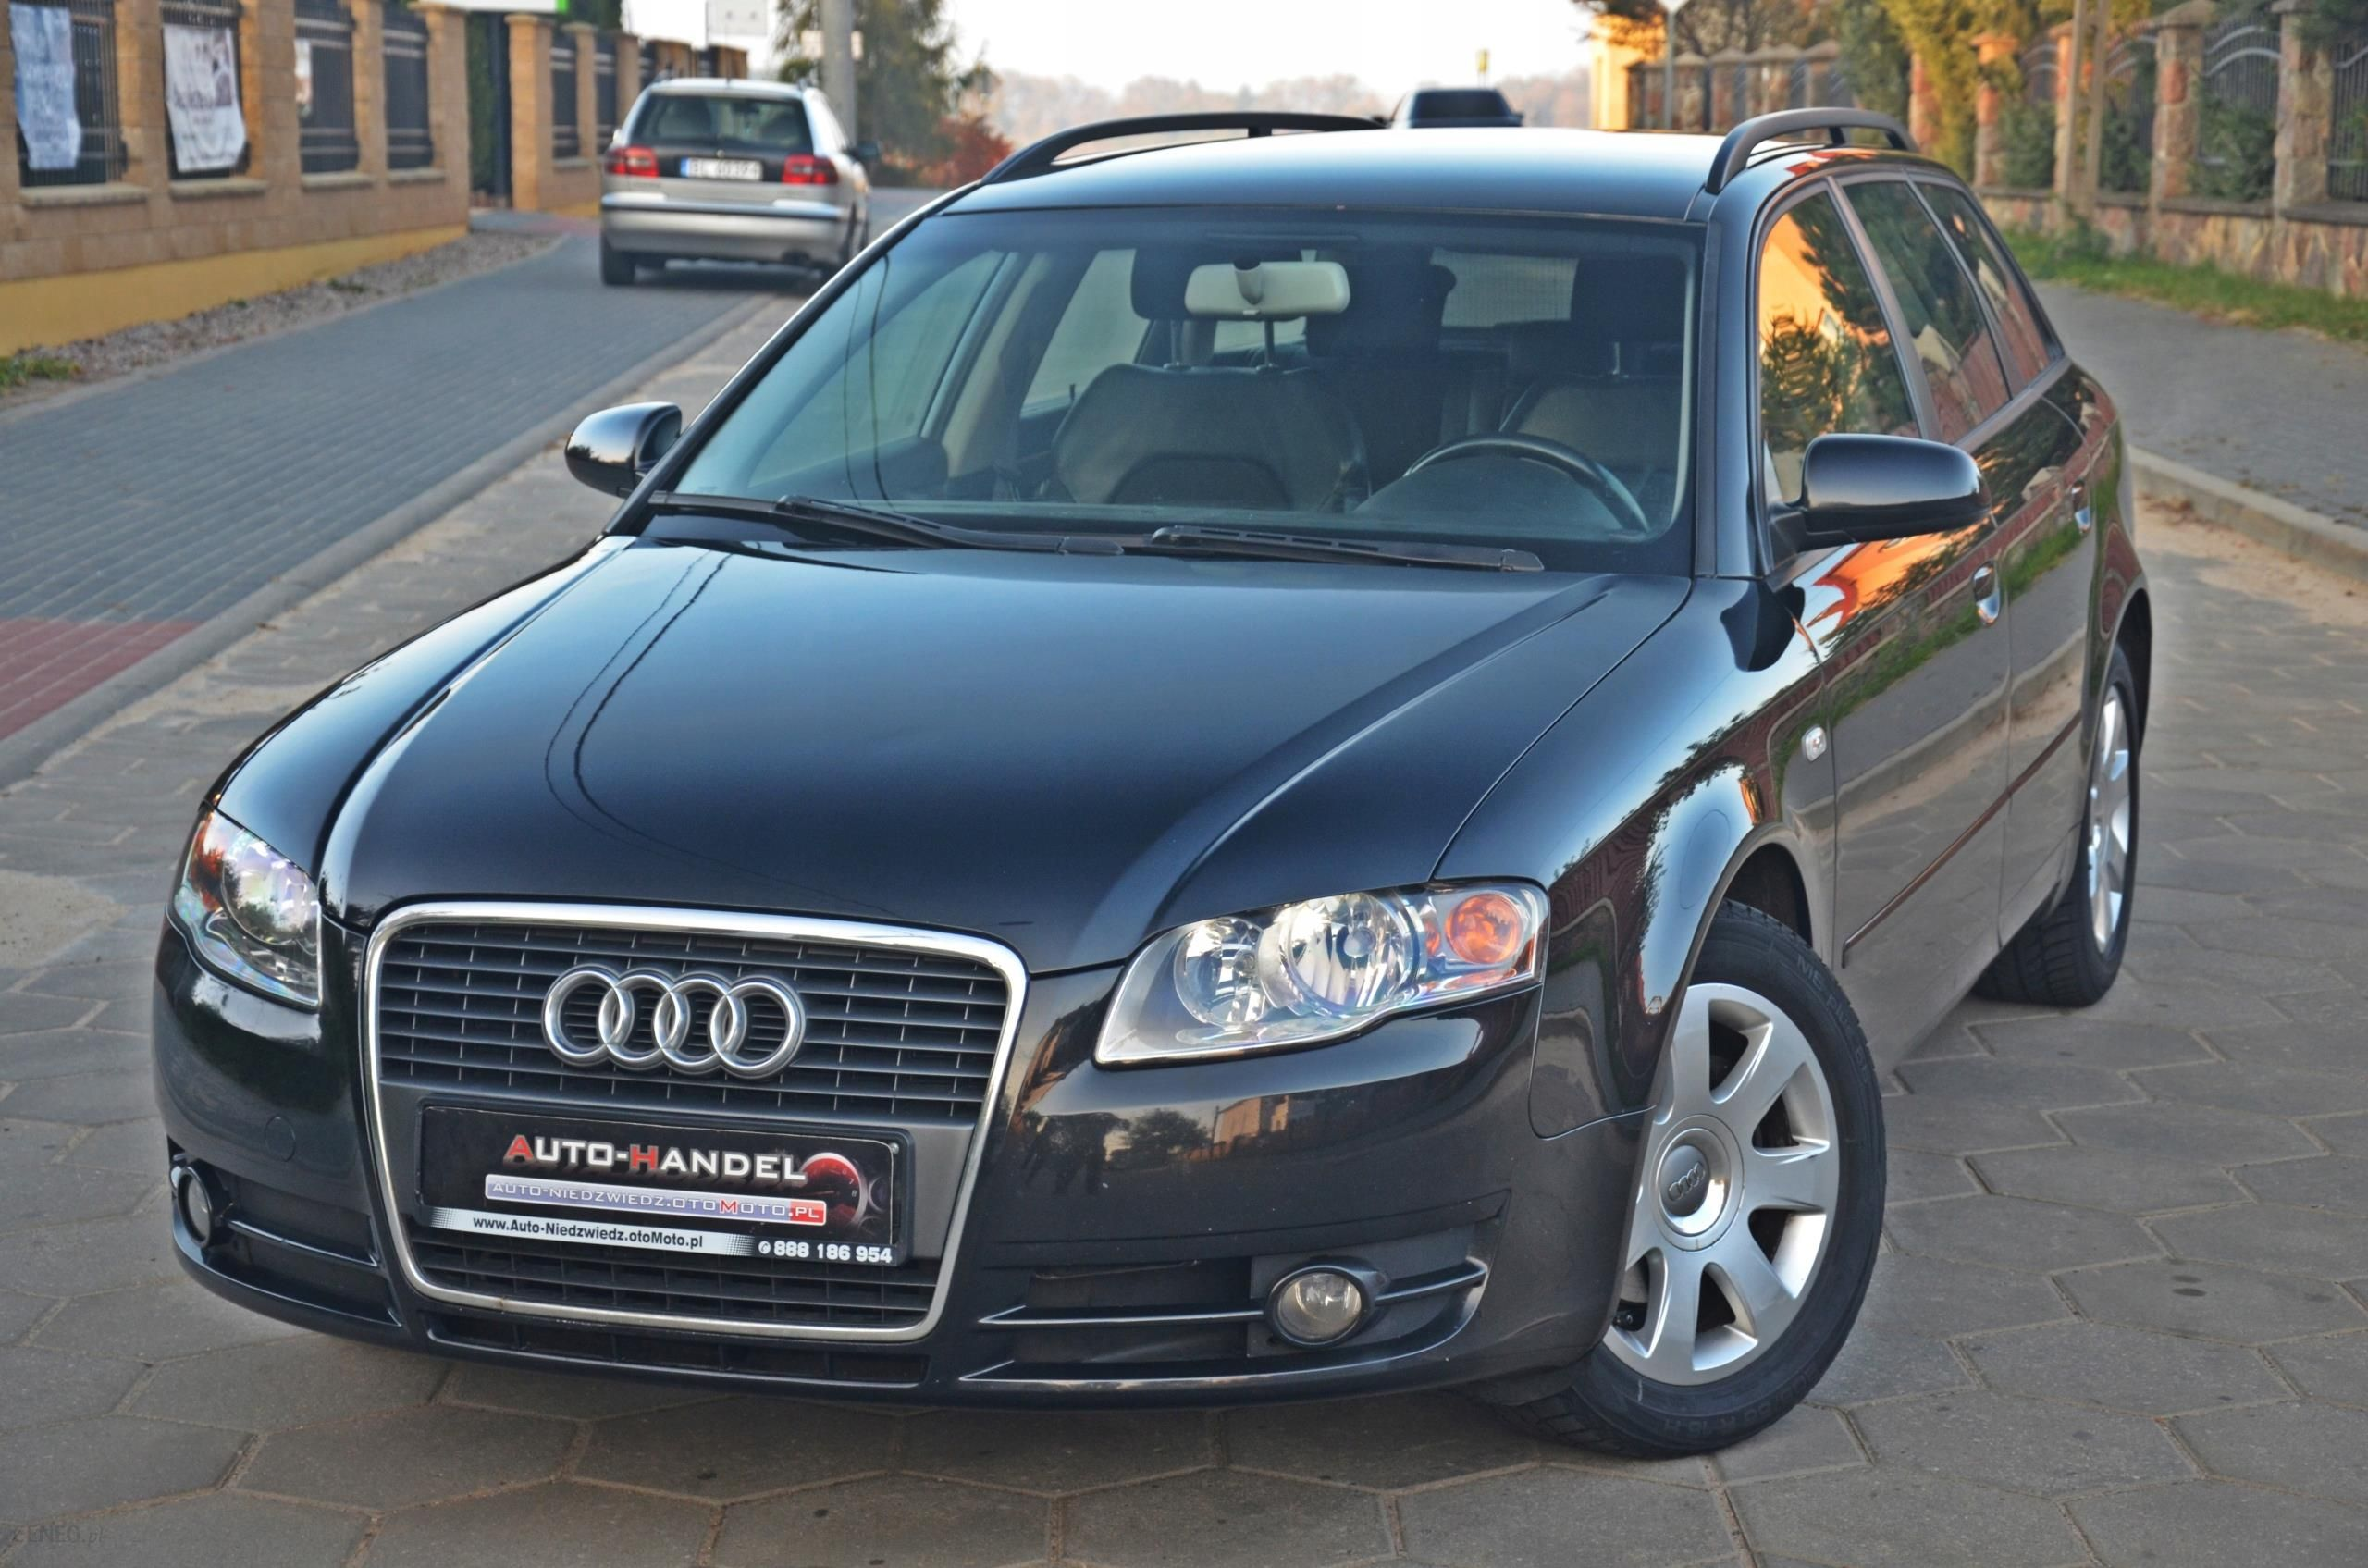 Audi A4 B7 19 Tdi Skóry Alkantara Sprowadzona Opinie I Ceny Na